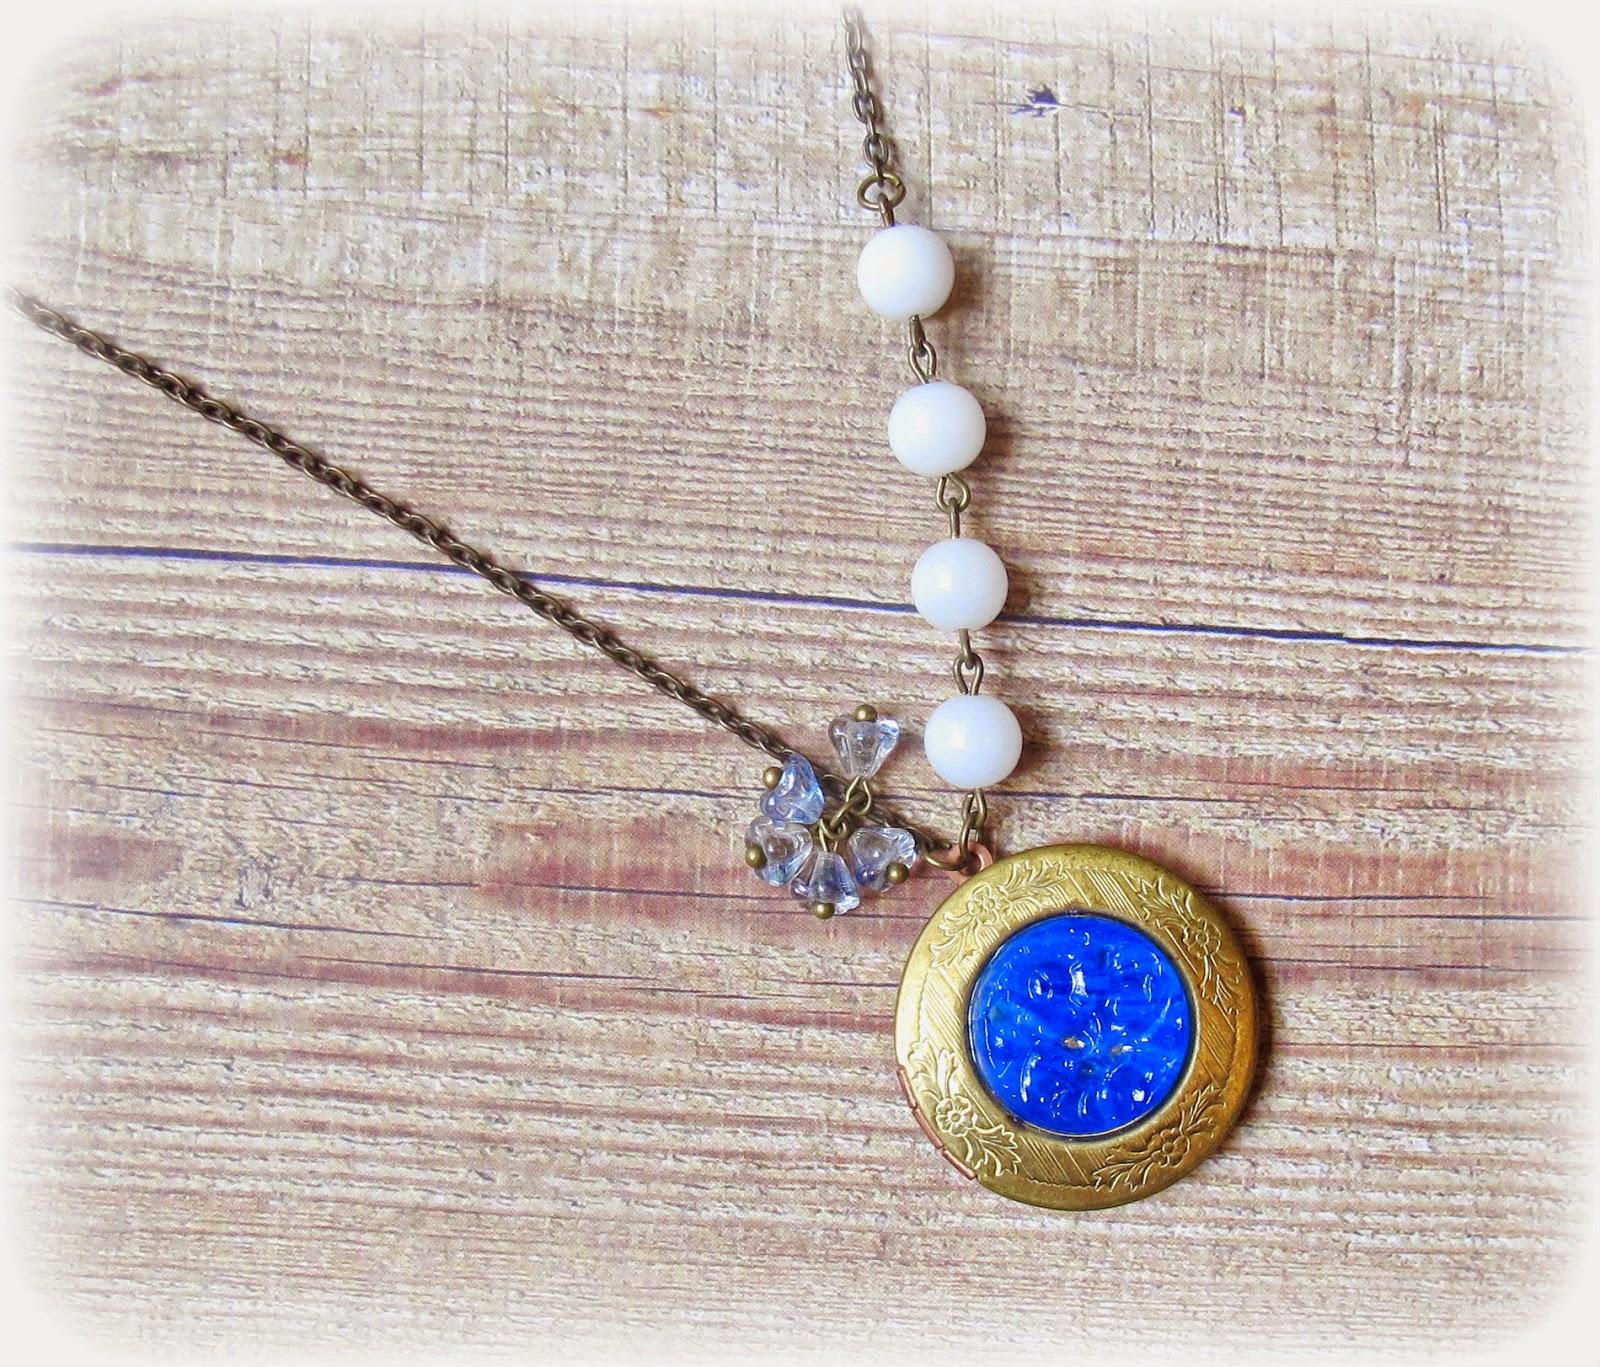 image mr darcy locket necklace pride and prejudice jane austen brass blue white vintage two cheeky monkeys